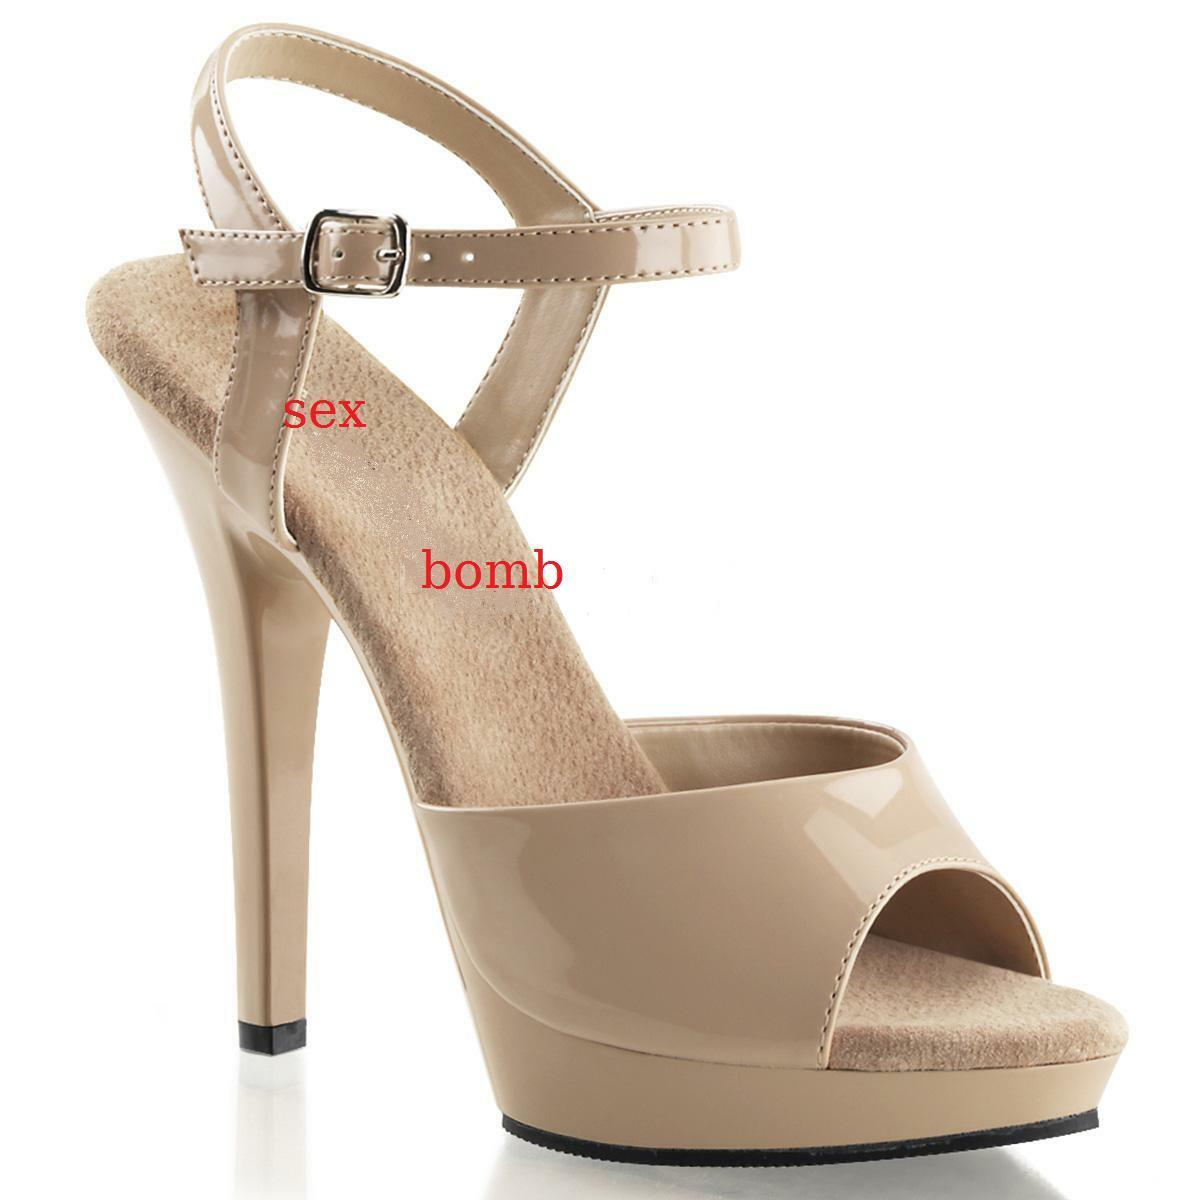 SEXY Sandale plateau tacco 13 dal 35 NUDO al 42 NUDO 35 cinturino scarpe fashion GLAMOUR 54dbd4